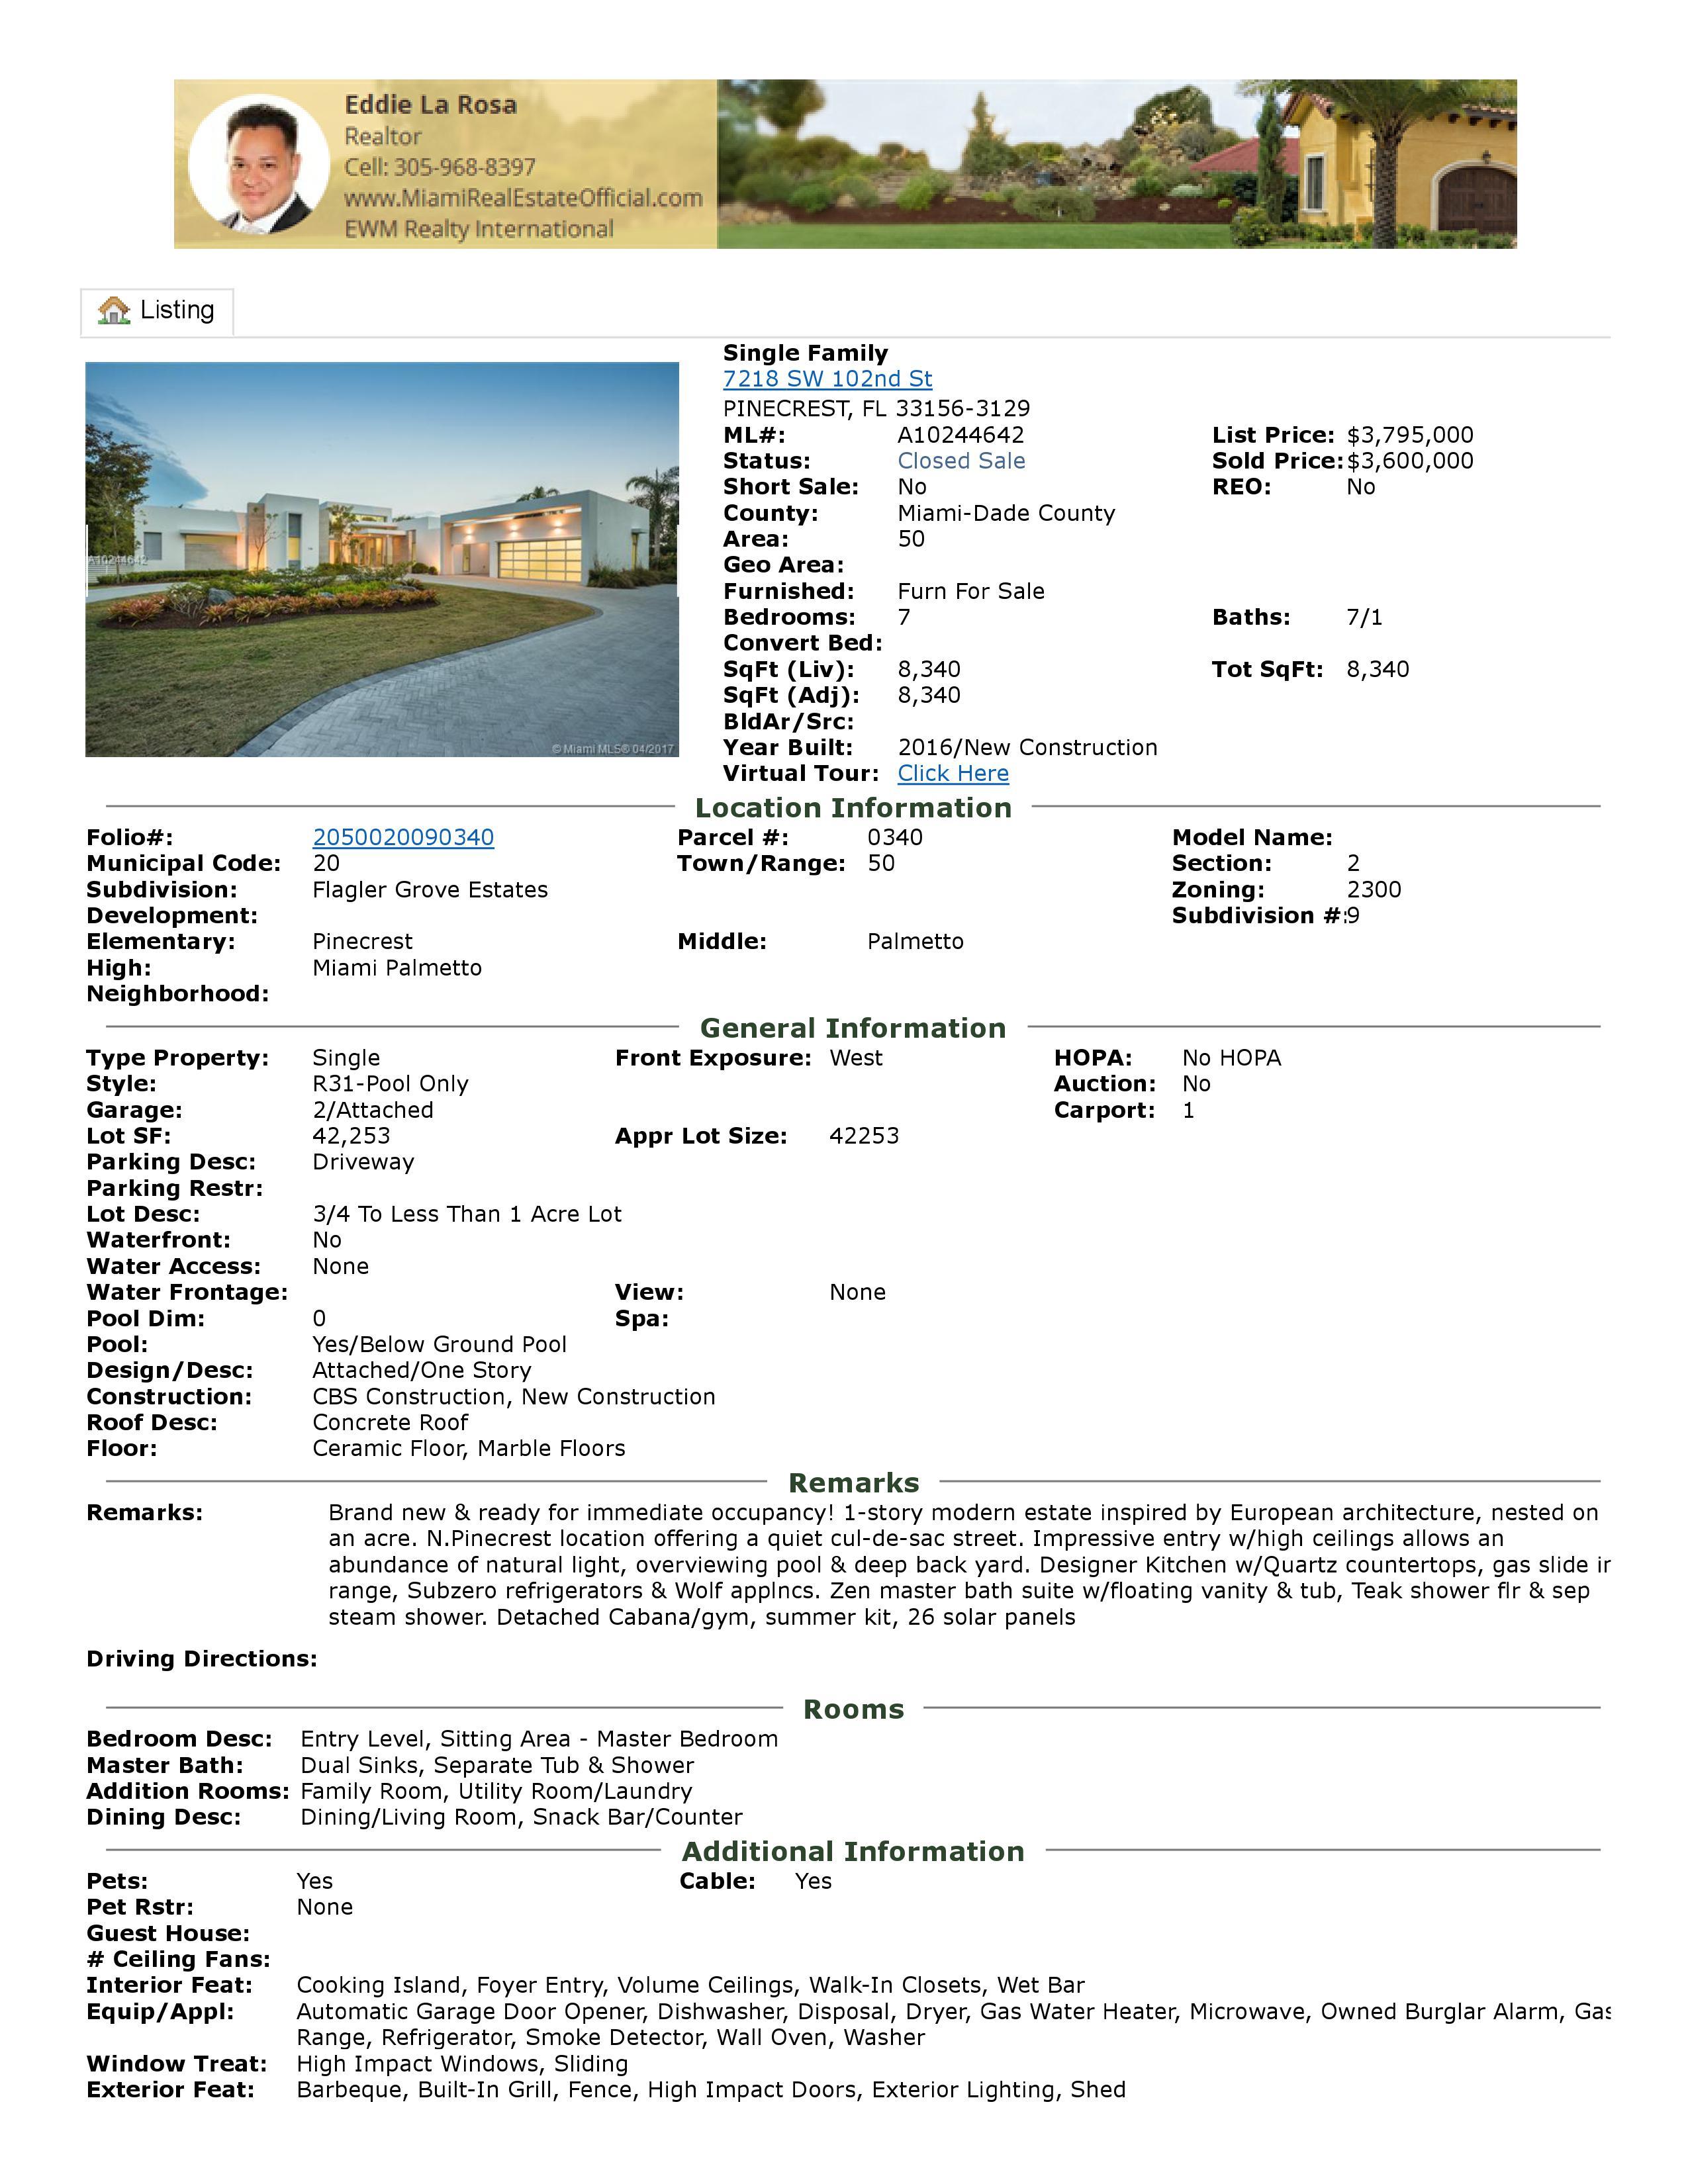 7218 sw 102 street pinecrest florida 33156